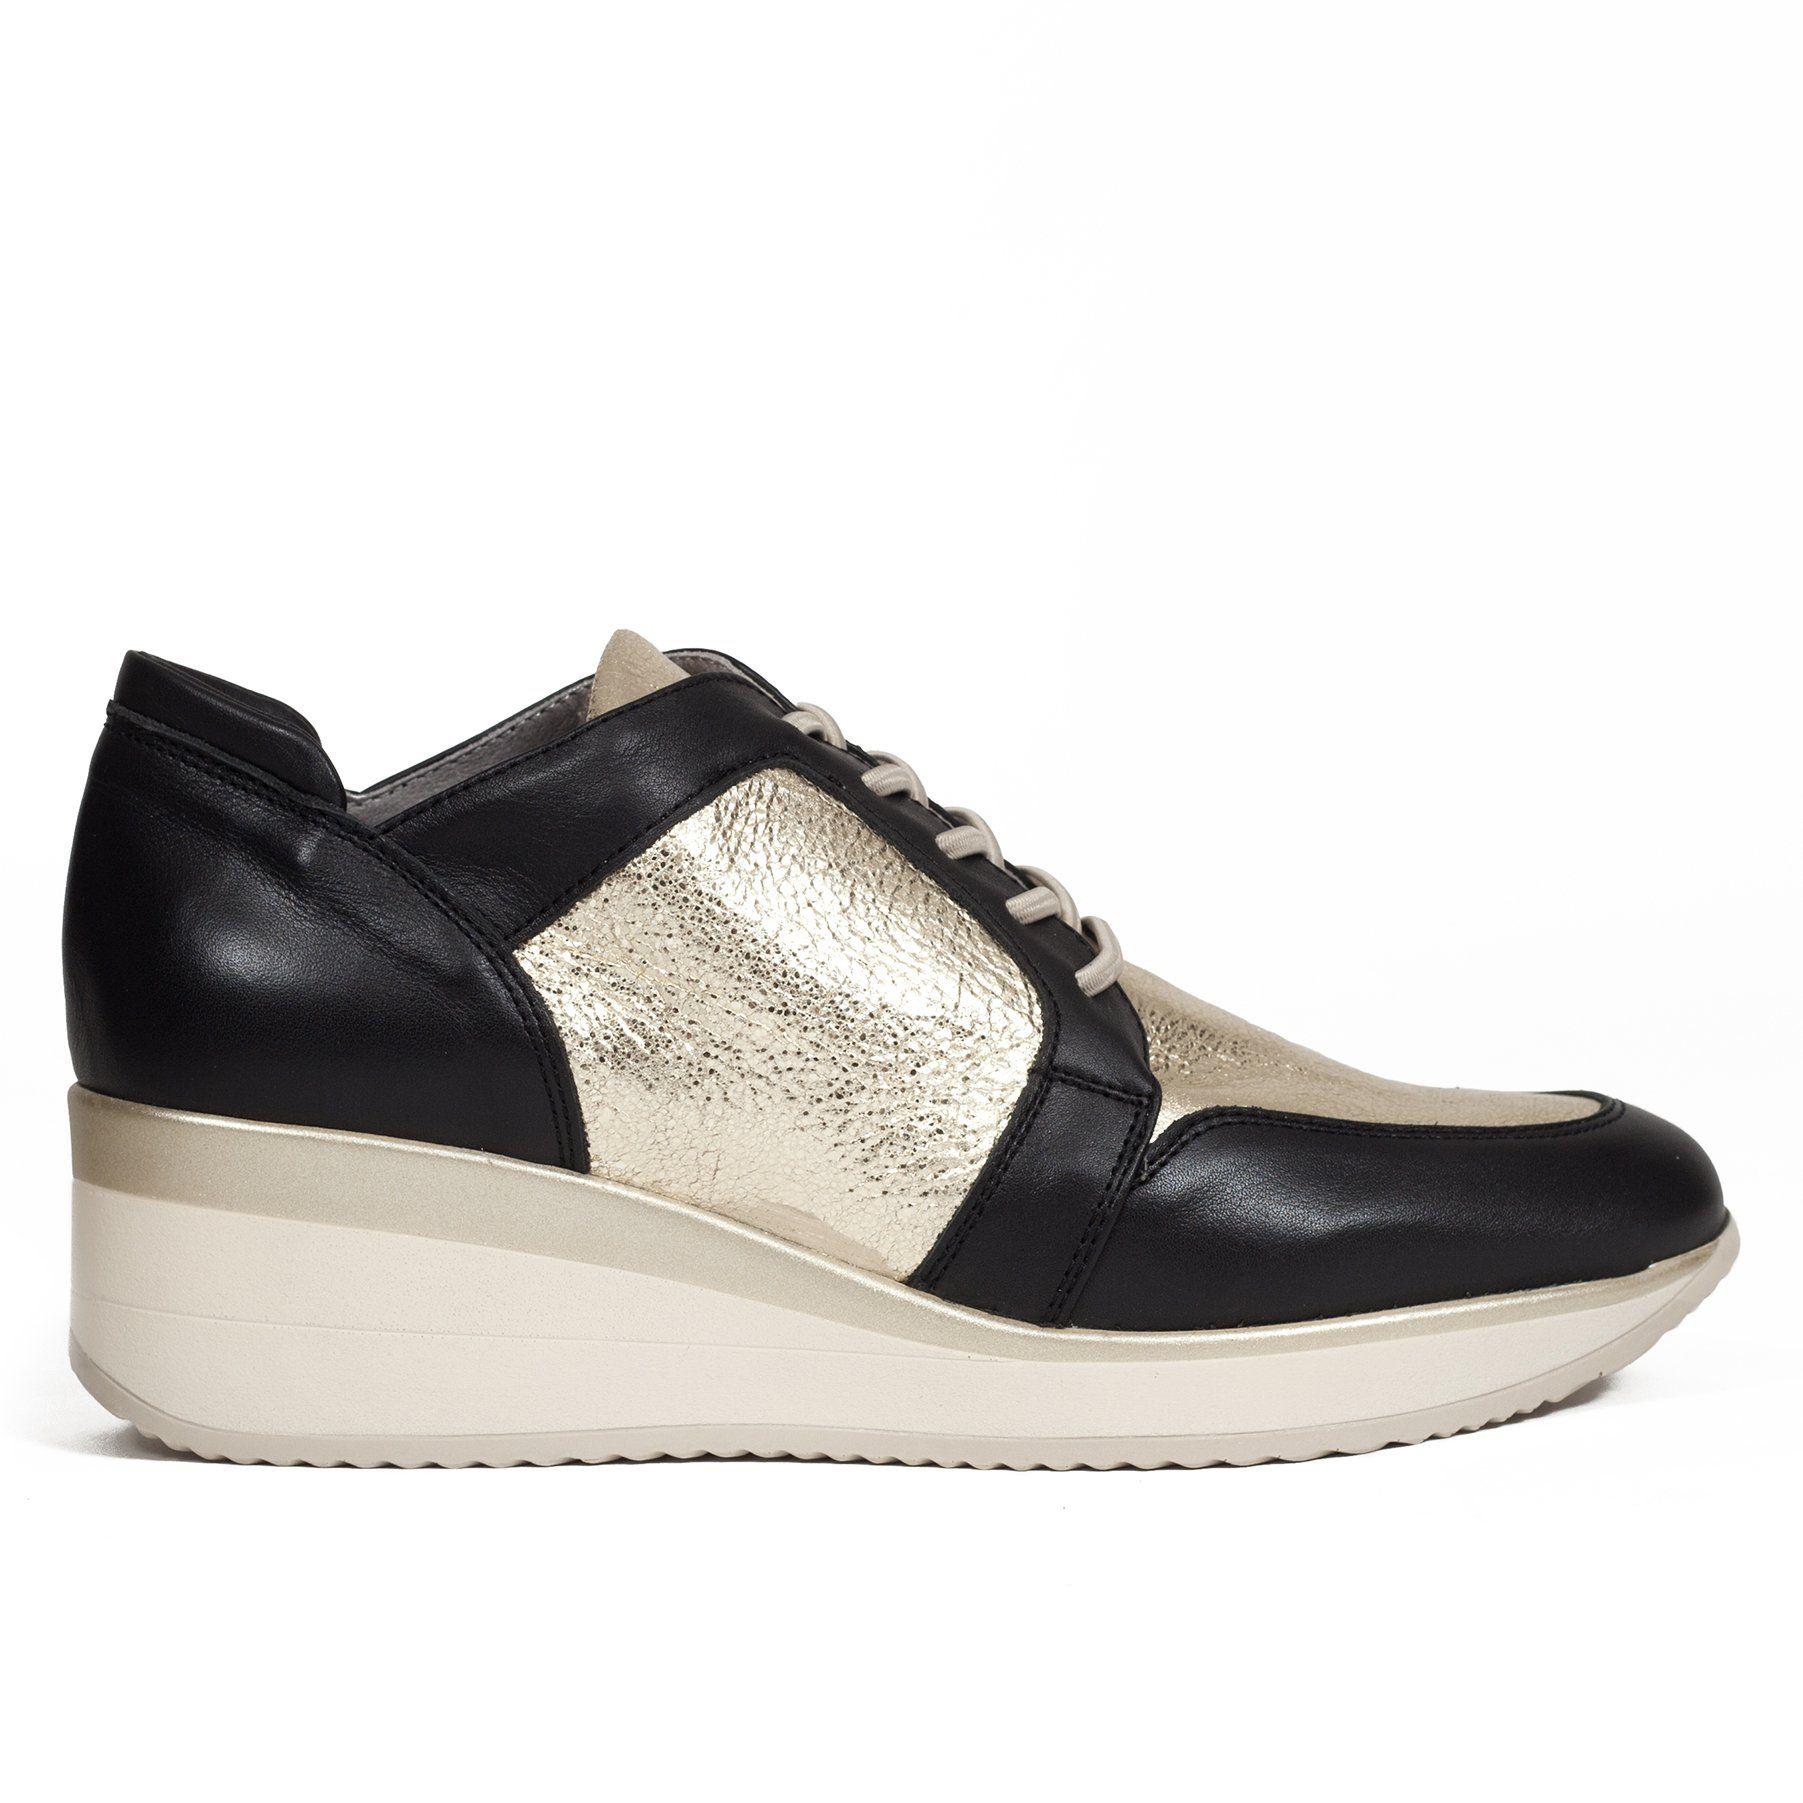 Zapato Deportivo cuña mujer Oro MEMORY FOAM - miMaO Zapatos – miMaO  ShopOnline a8cdd4ea162